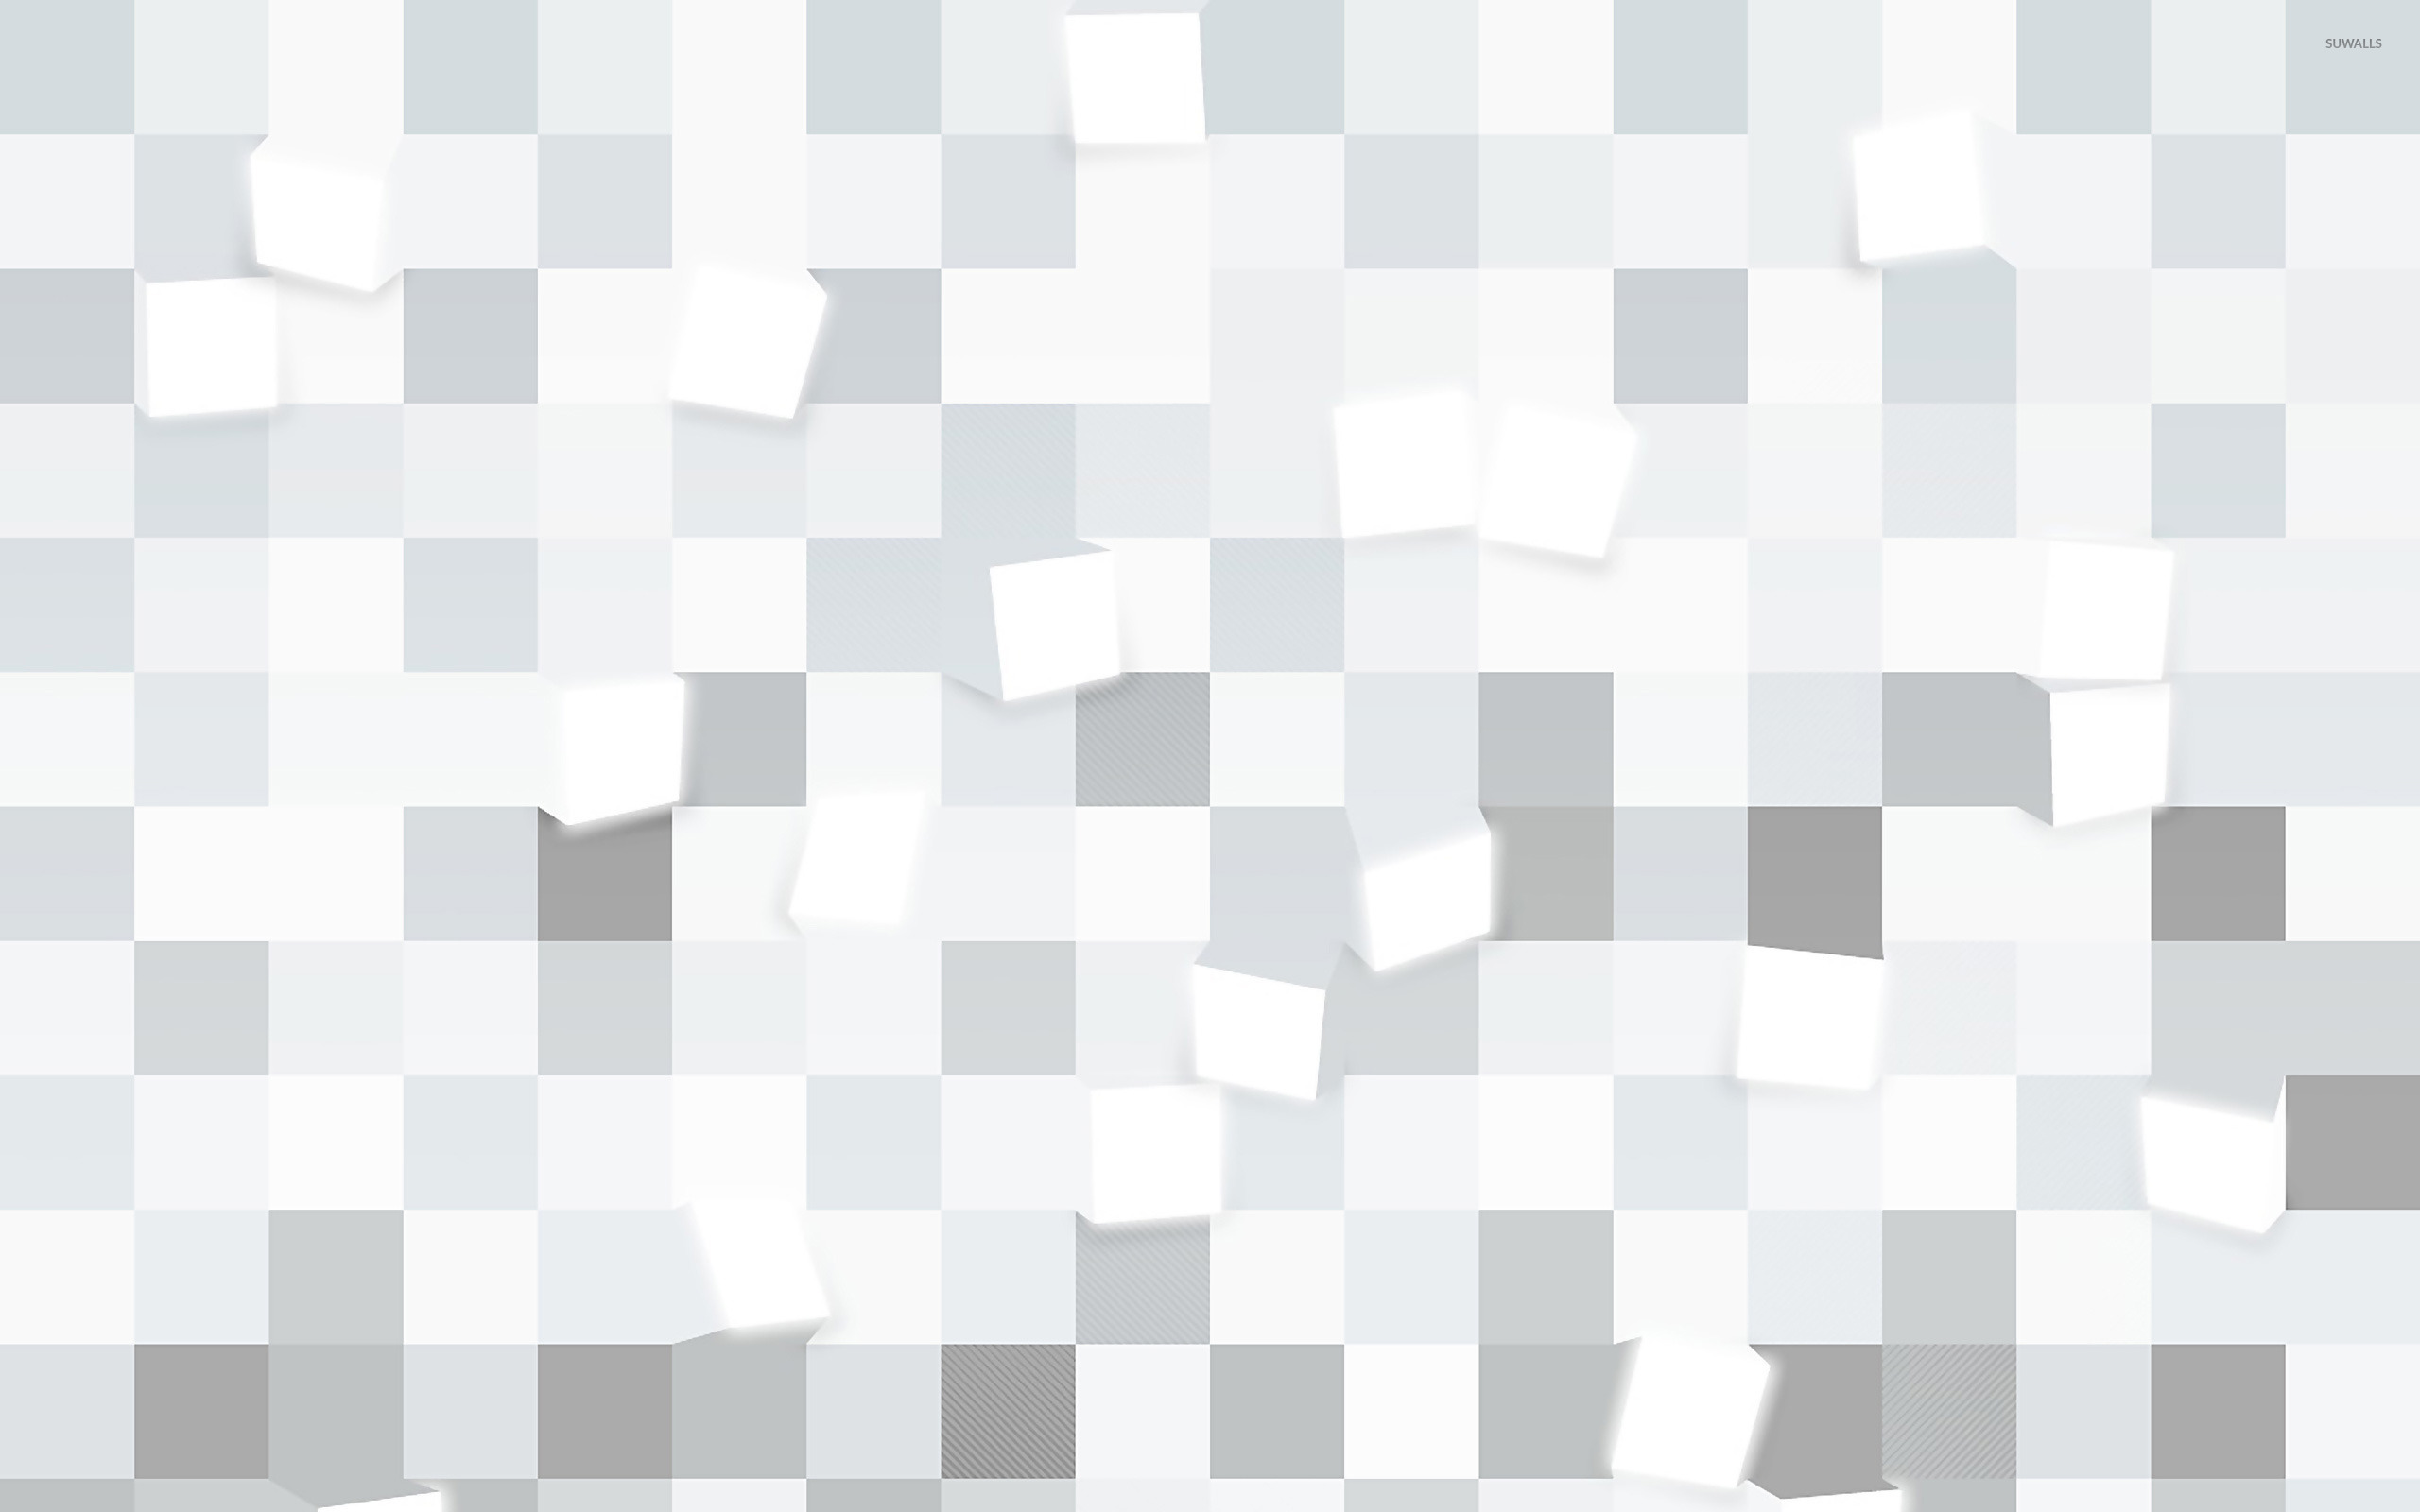 e886fd22f5fd8 Glowing gray cubes wallpaper - 3D wallpapers - #25156